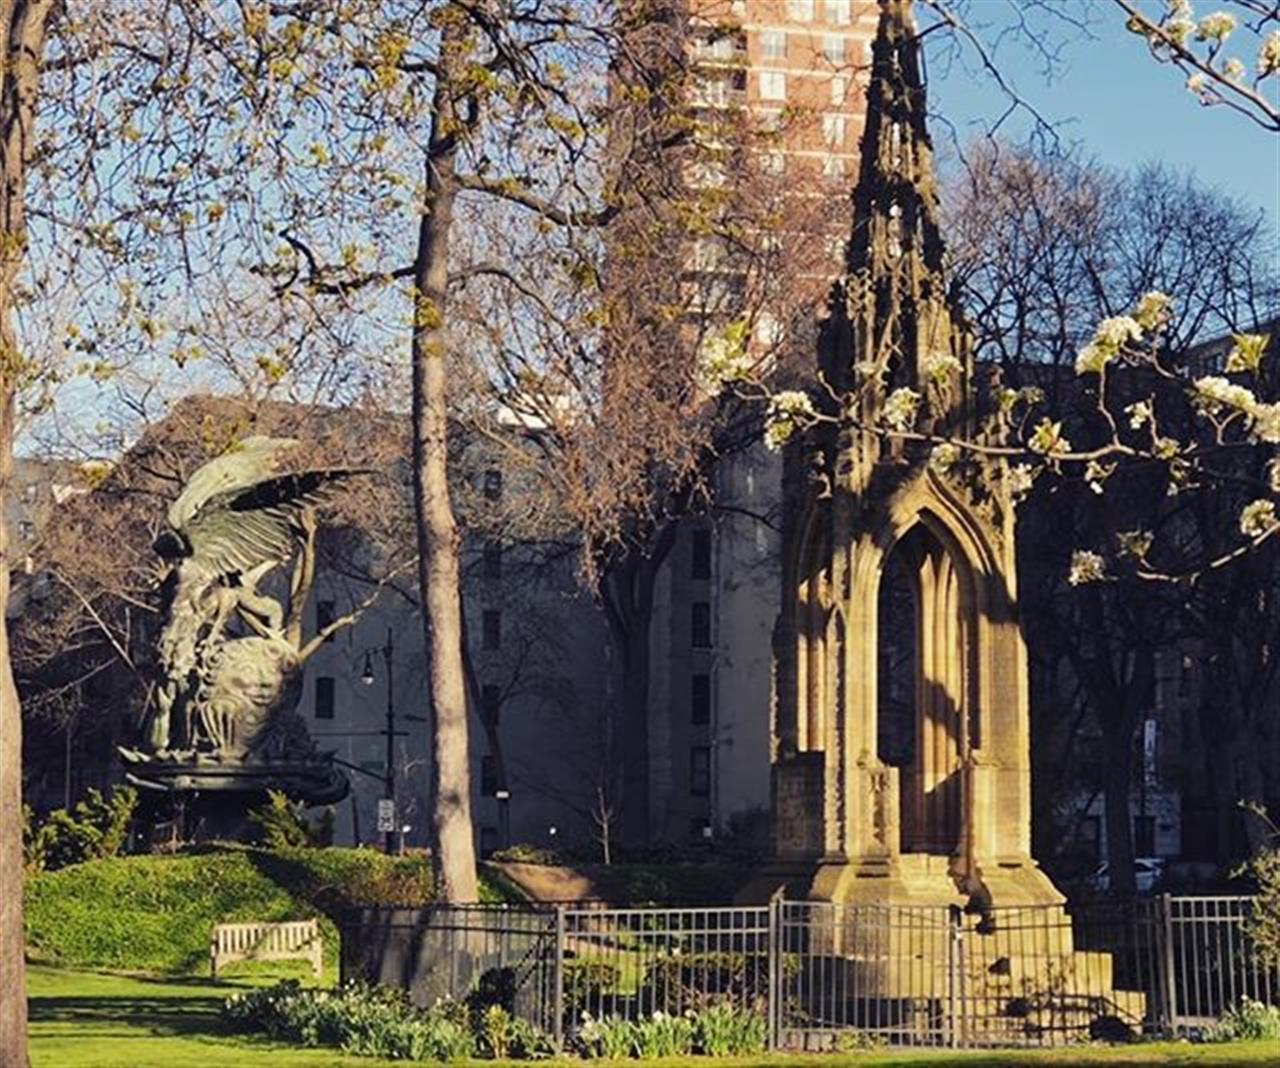 Glorious Monday on the Close @Cathedralstjohndivine #mondaymorning #mondaymotivation #MaryannKnowsManhattan #maryanncjohnson #halstead #leadingrelocal #exploreyourhood #cathedralstjohnthedivine